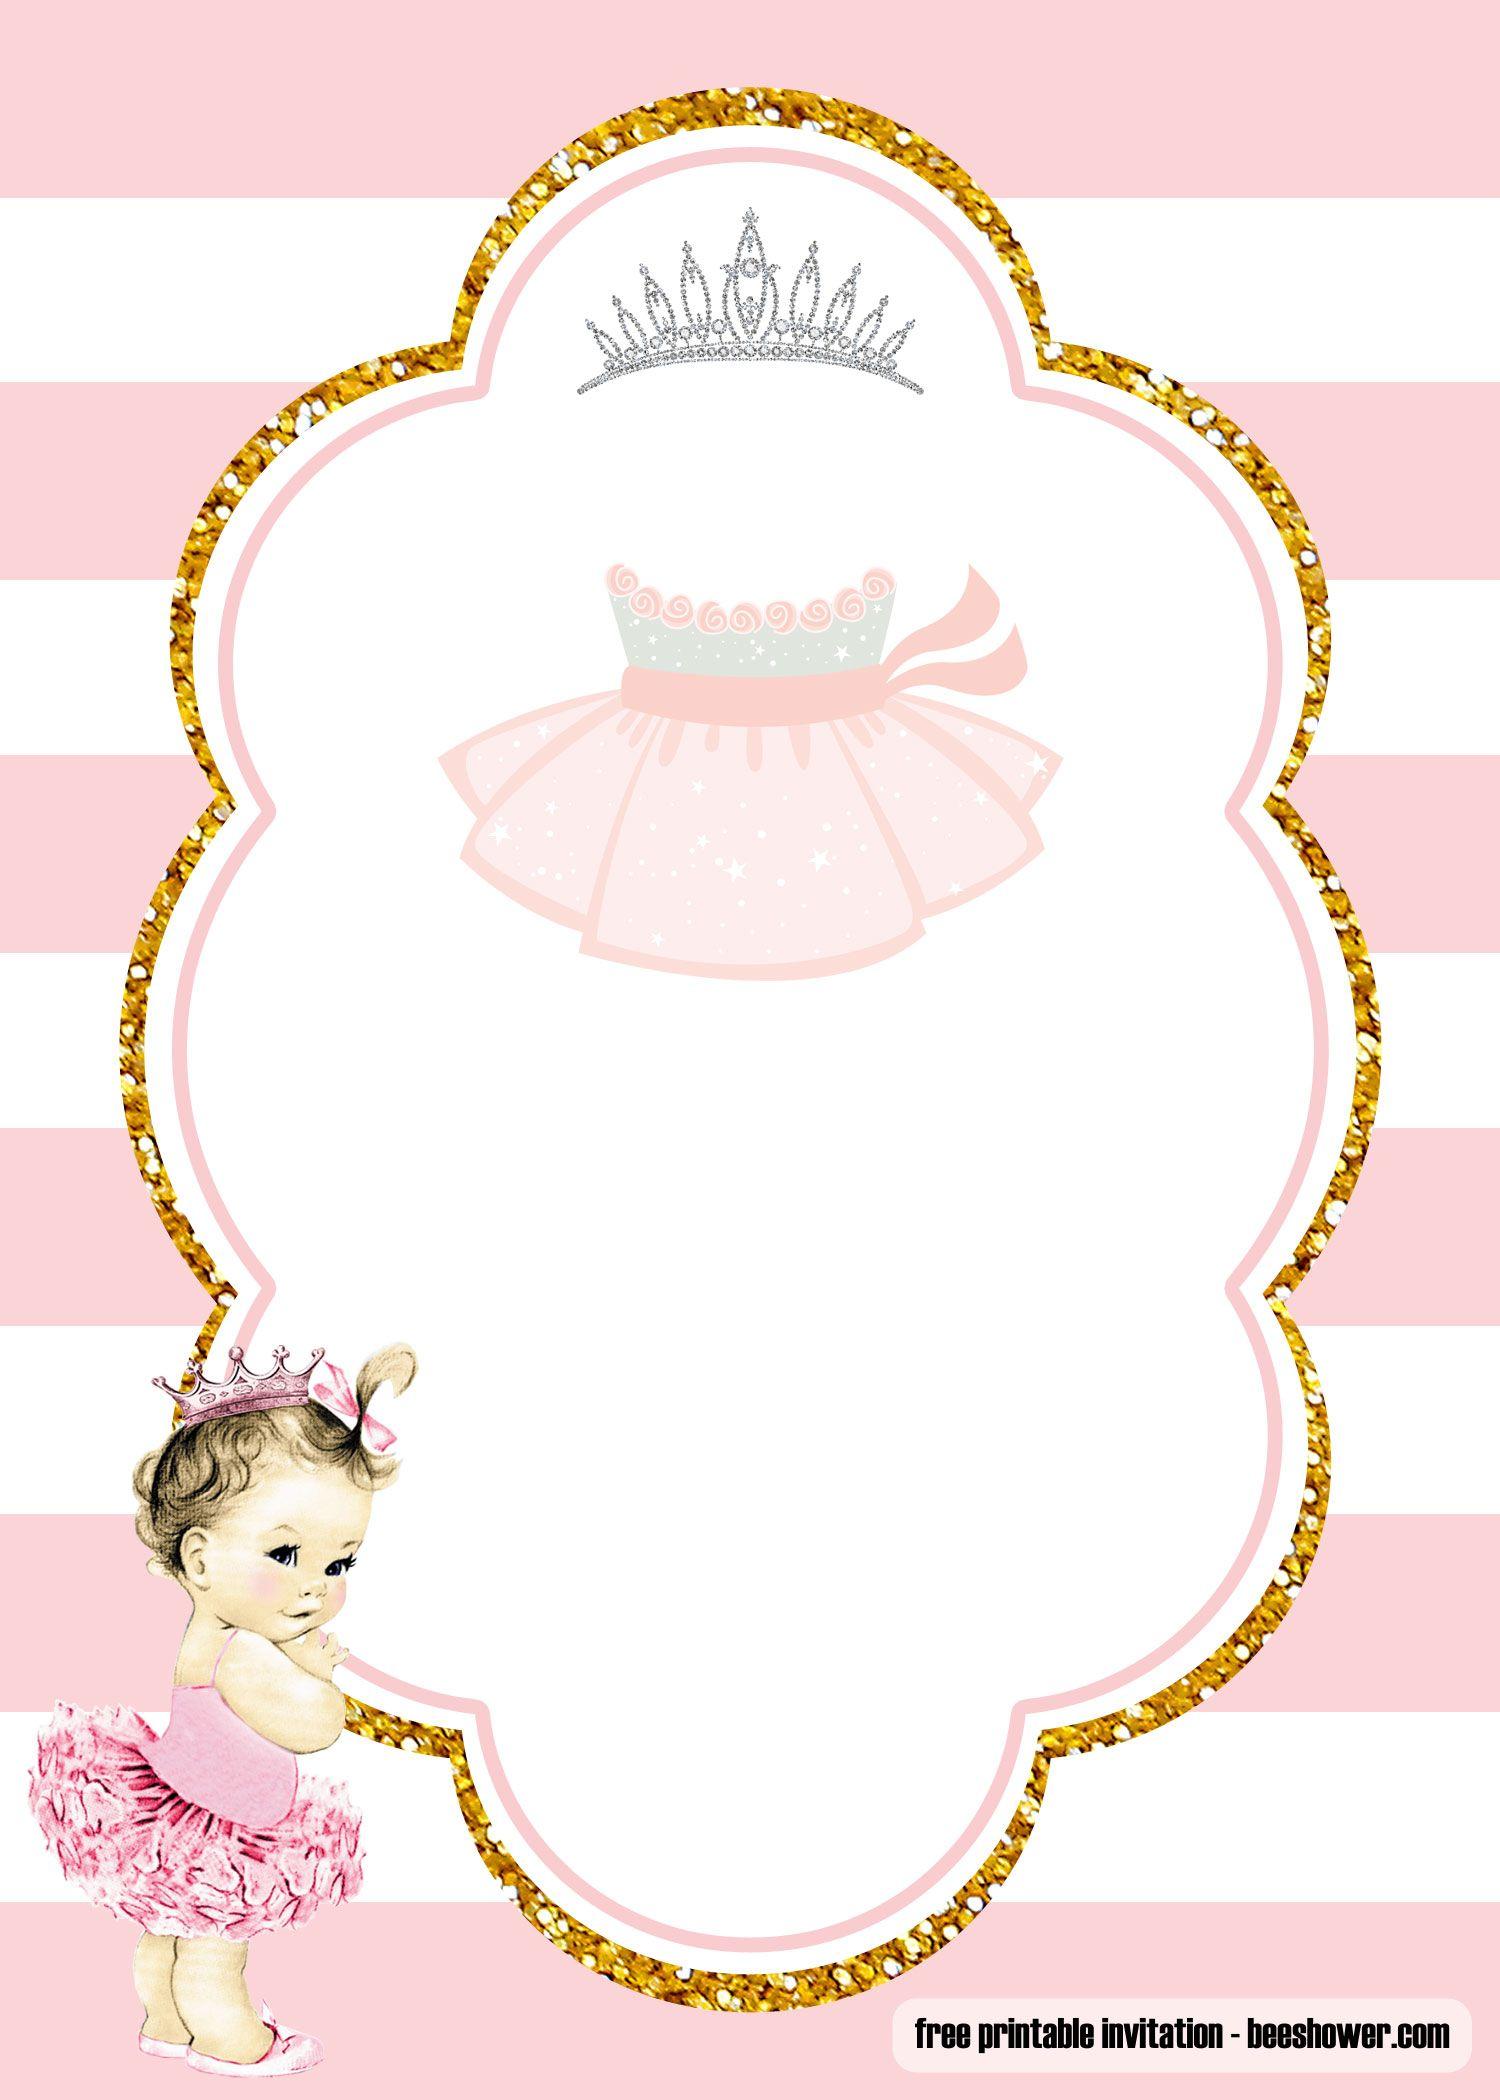 Free Ballerina Baby Shower Invitations Templates Ballerina Baby Shower Invitations Baby Shower Invitation Templates Ballerina Baby Showers